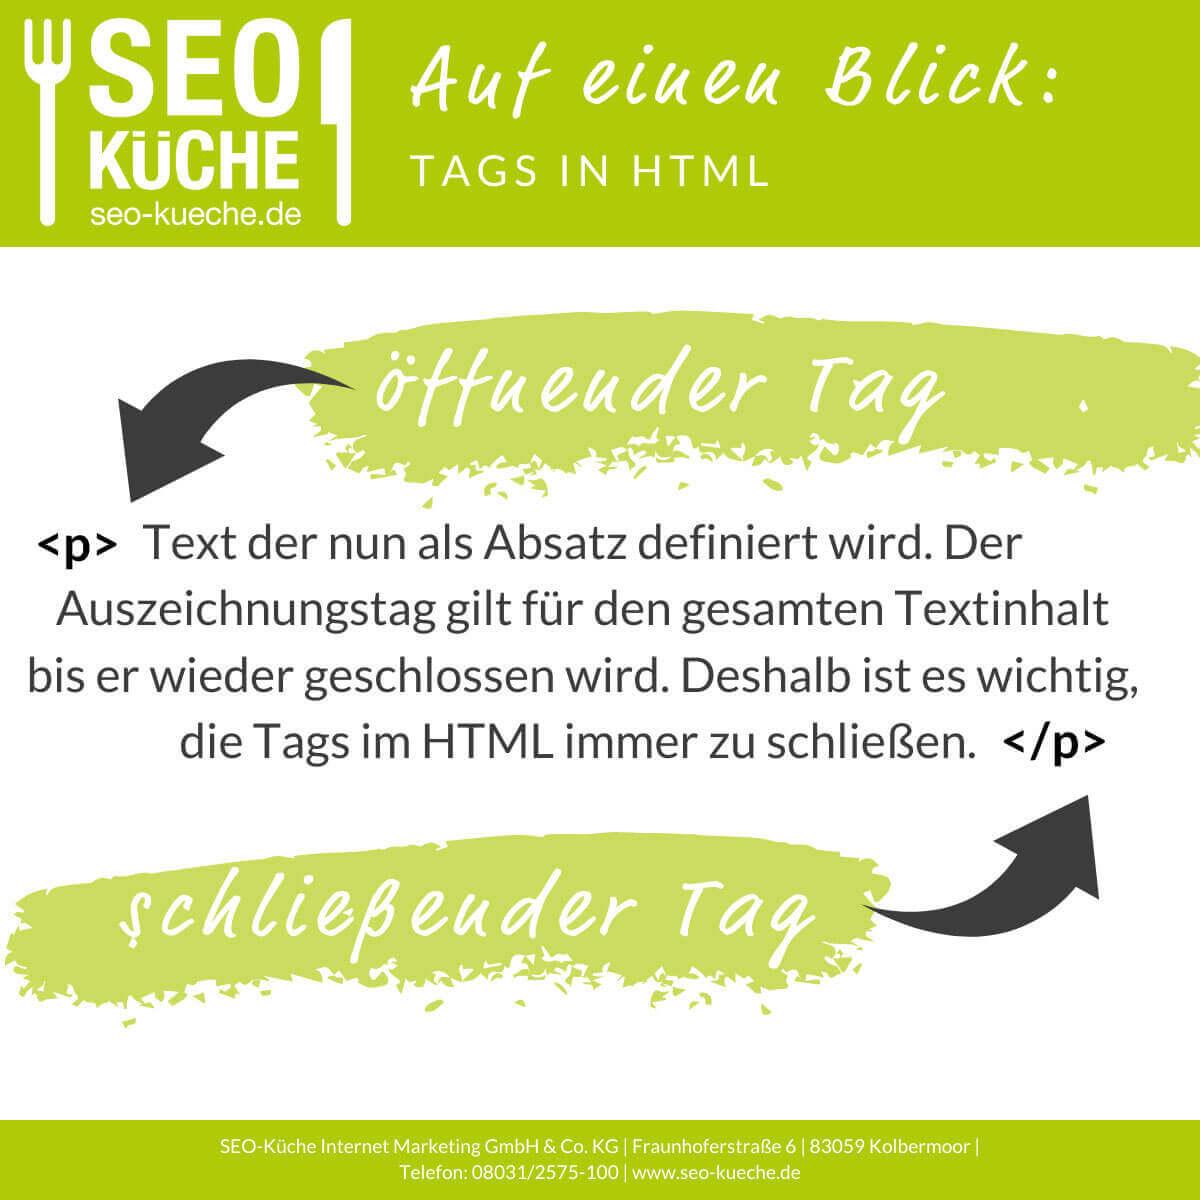 Tags im HTML